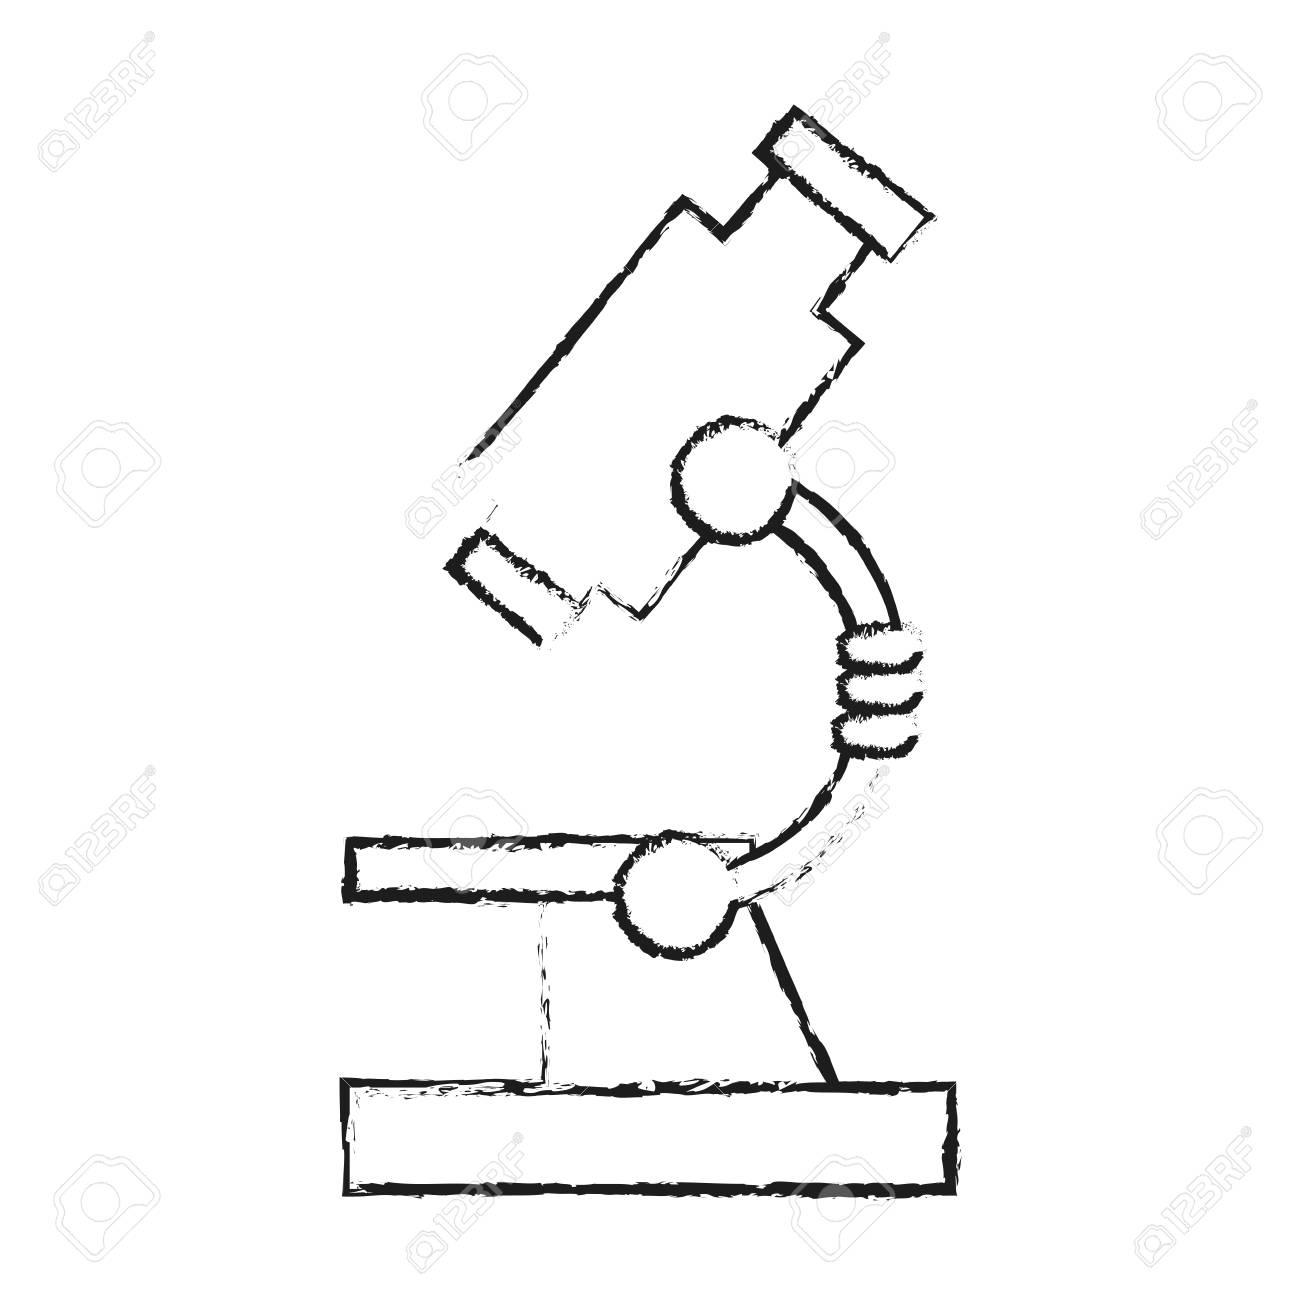 Black Blurred Silhouette Cartoon Microscope Science Tool Vector Illustration Stock